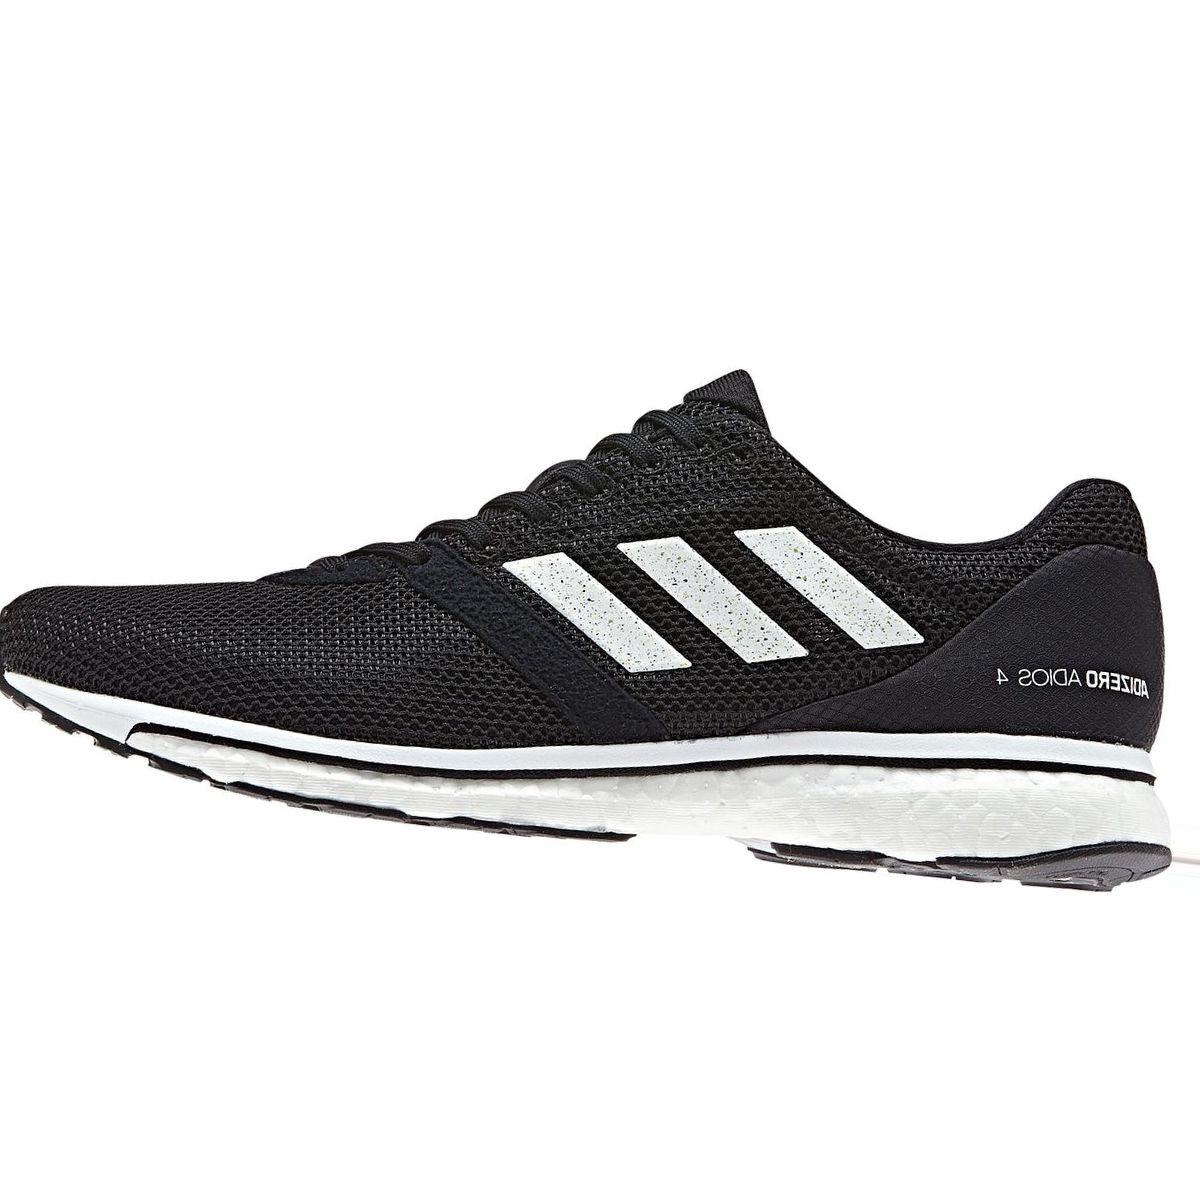 Adidas Adizero Adios 4 Boost Running Shoe - Men's